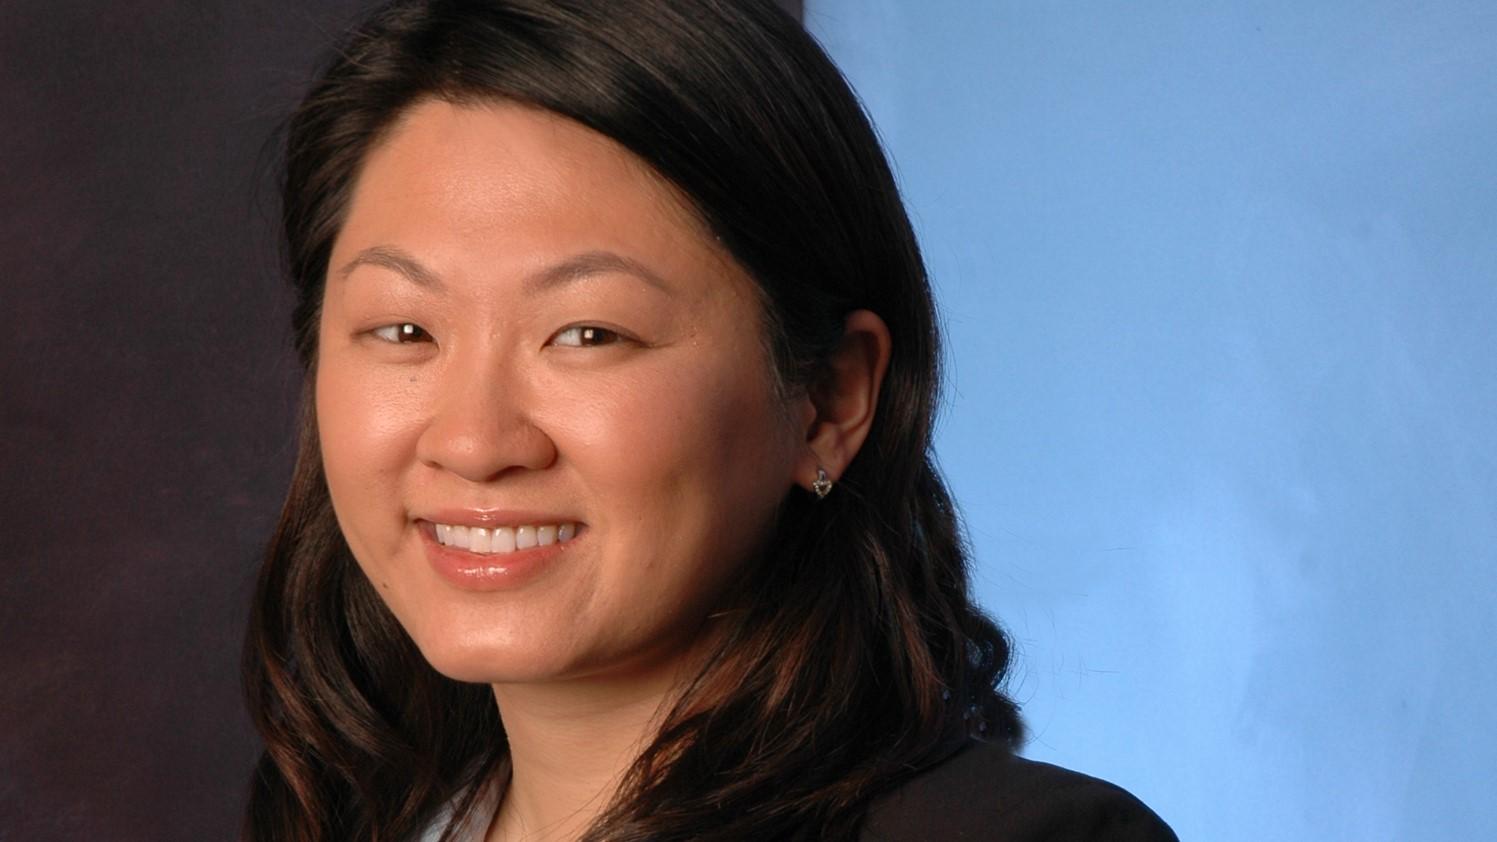 Minami Tamaki LLP Partner Olivia Serene Lee Elected to AILA Board of Governors